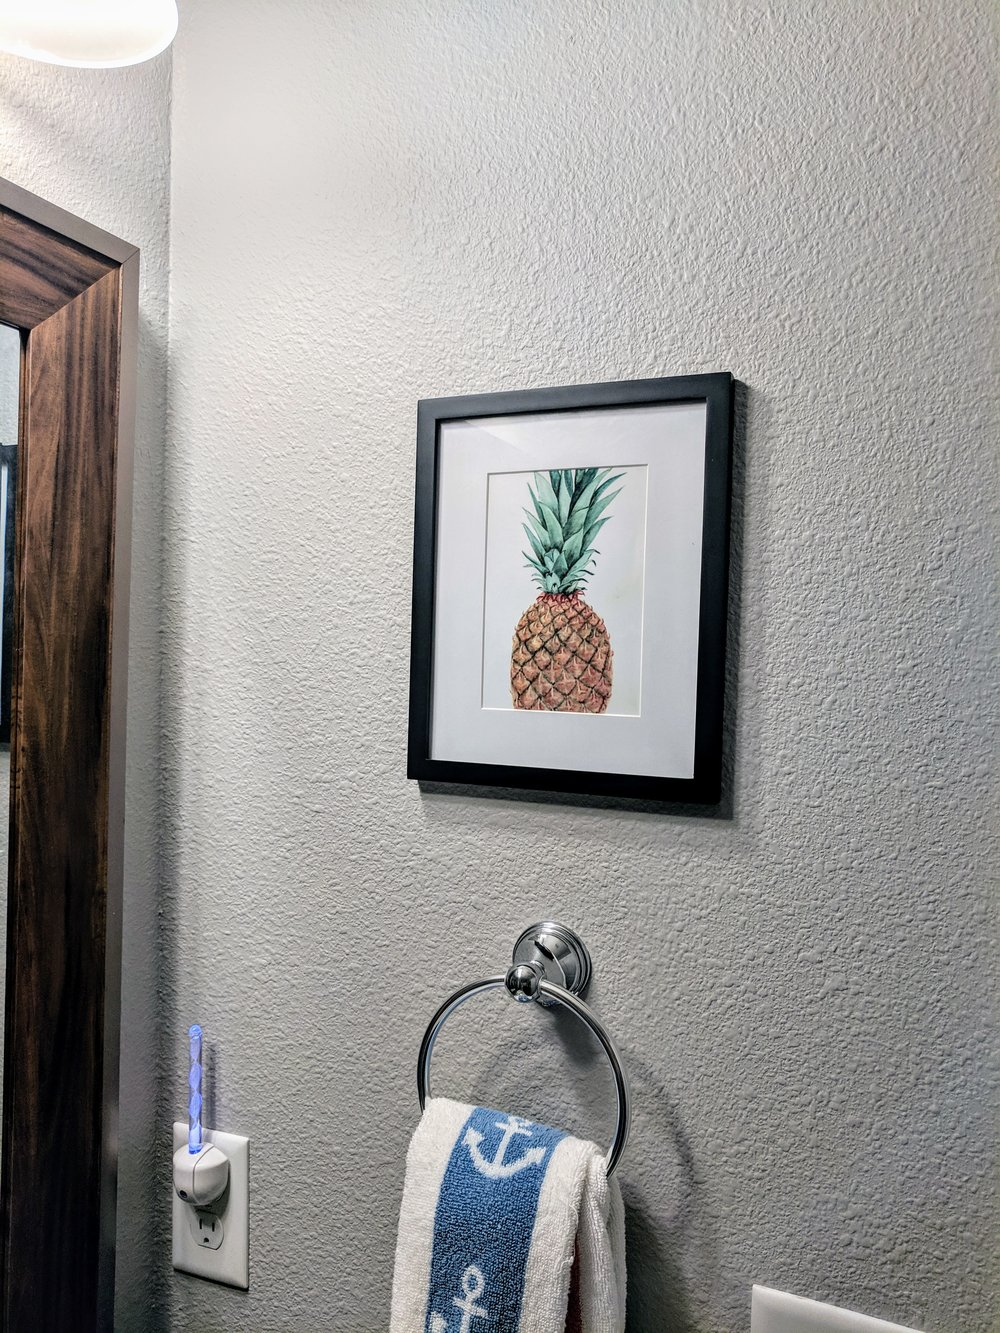 Pineapple print bathroom decor.